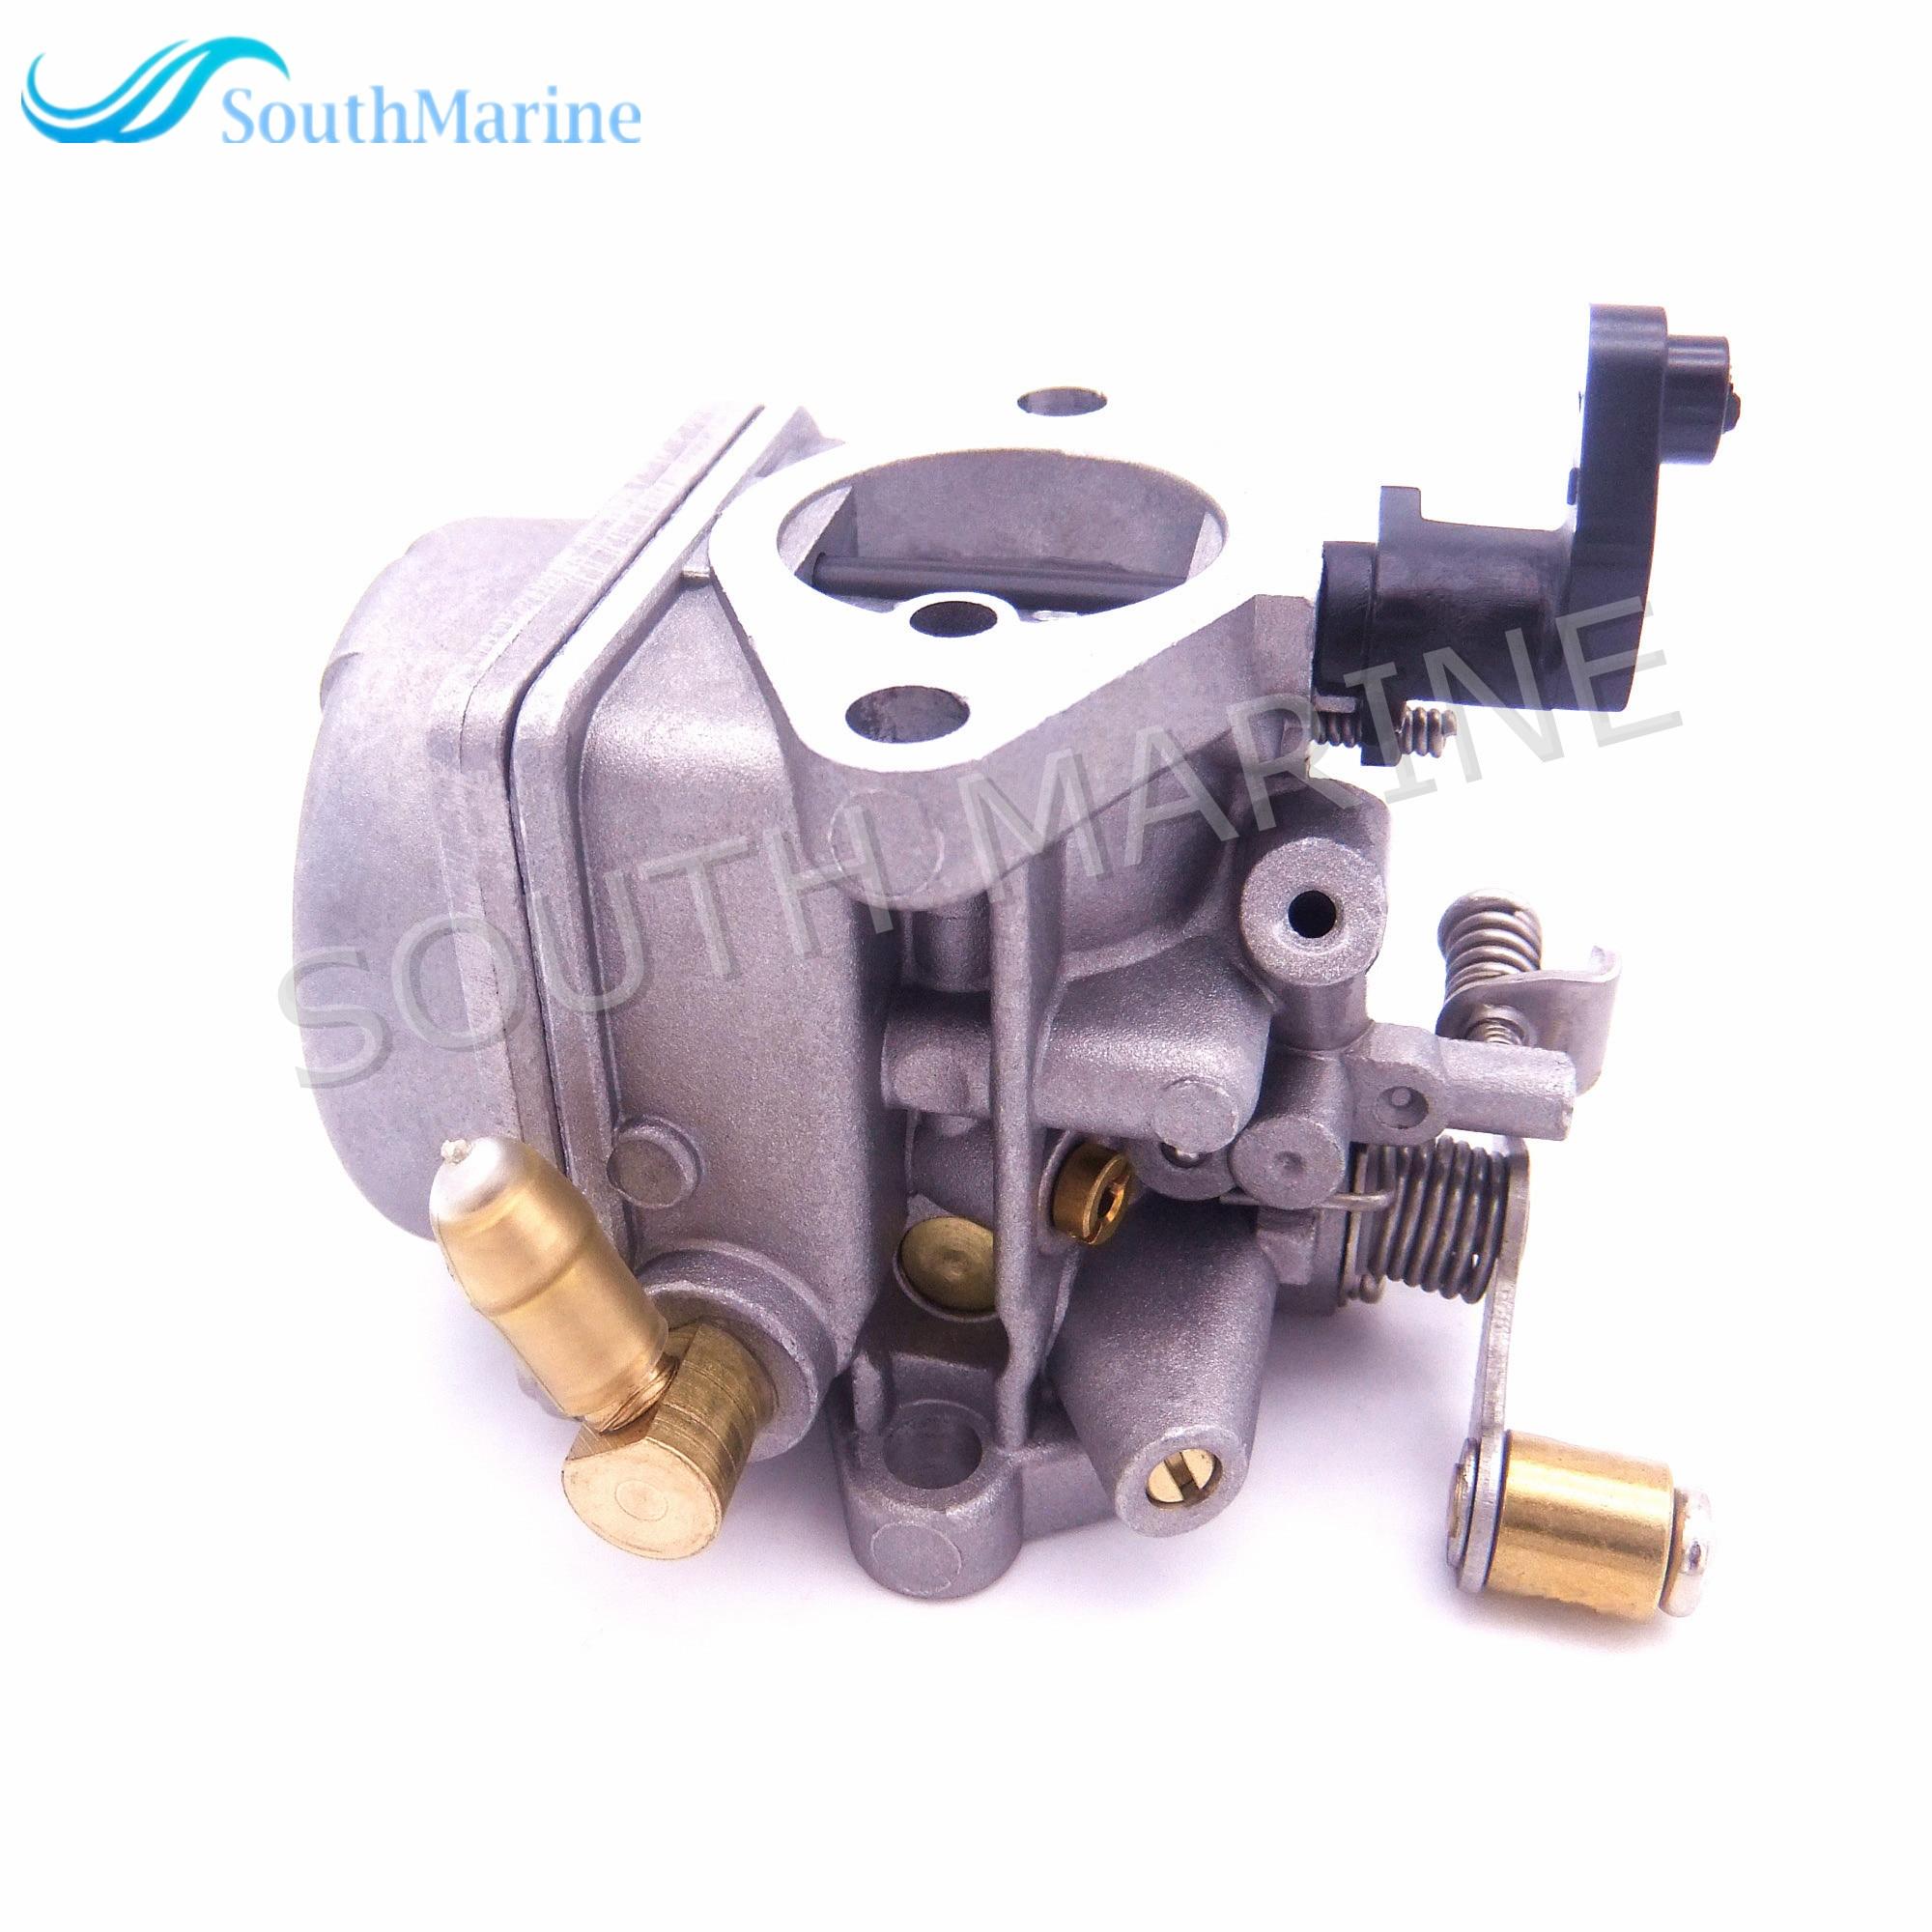 F6-04060000 carburateur Assy pour Parsun HDX Makara F5A F6A bateau moteur hors-bord